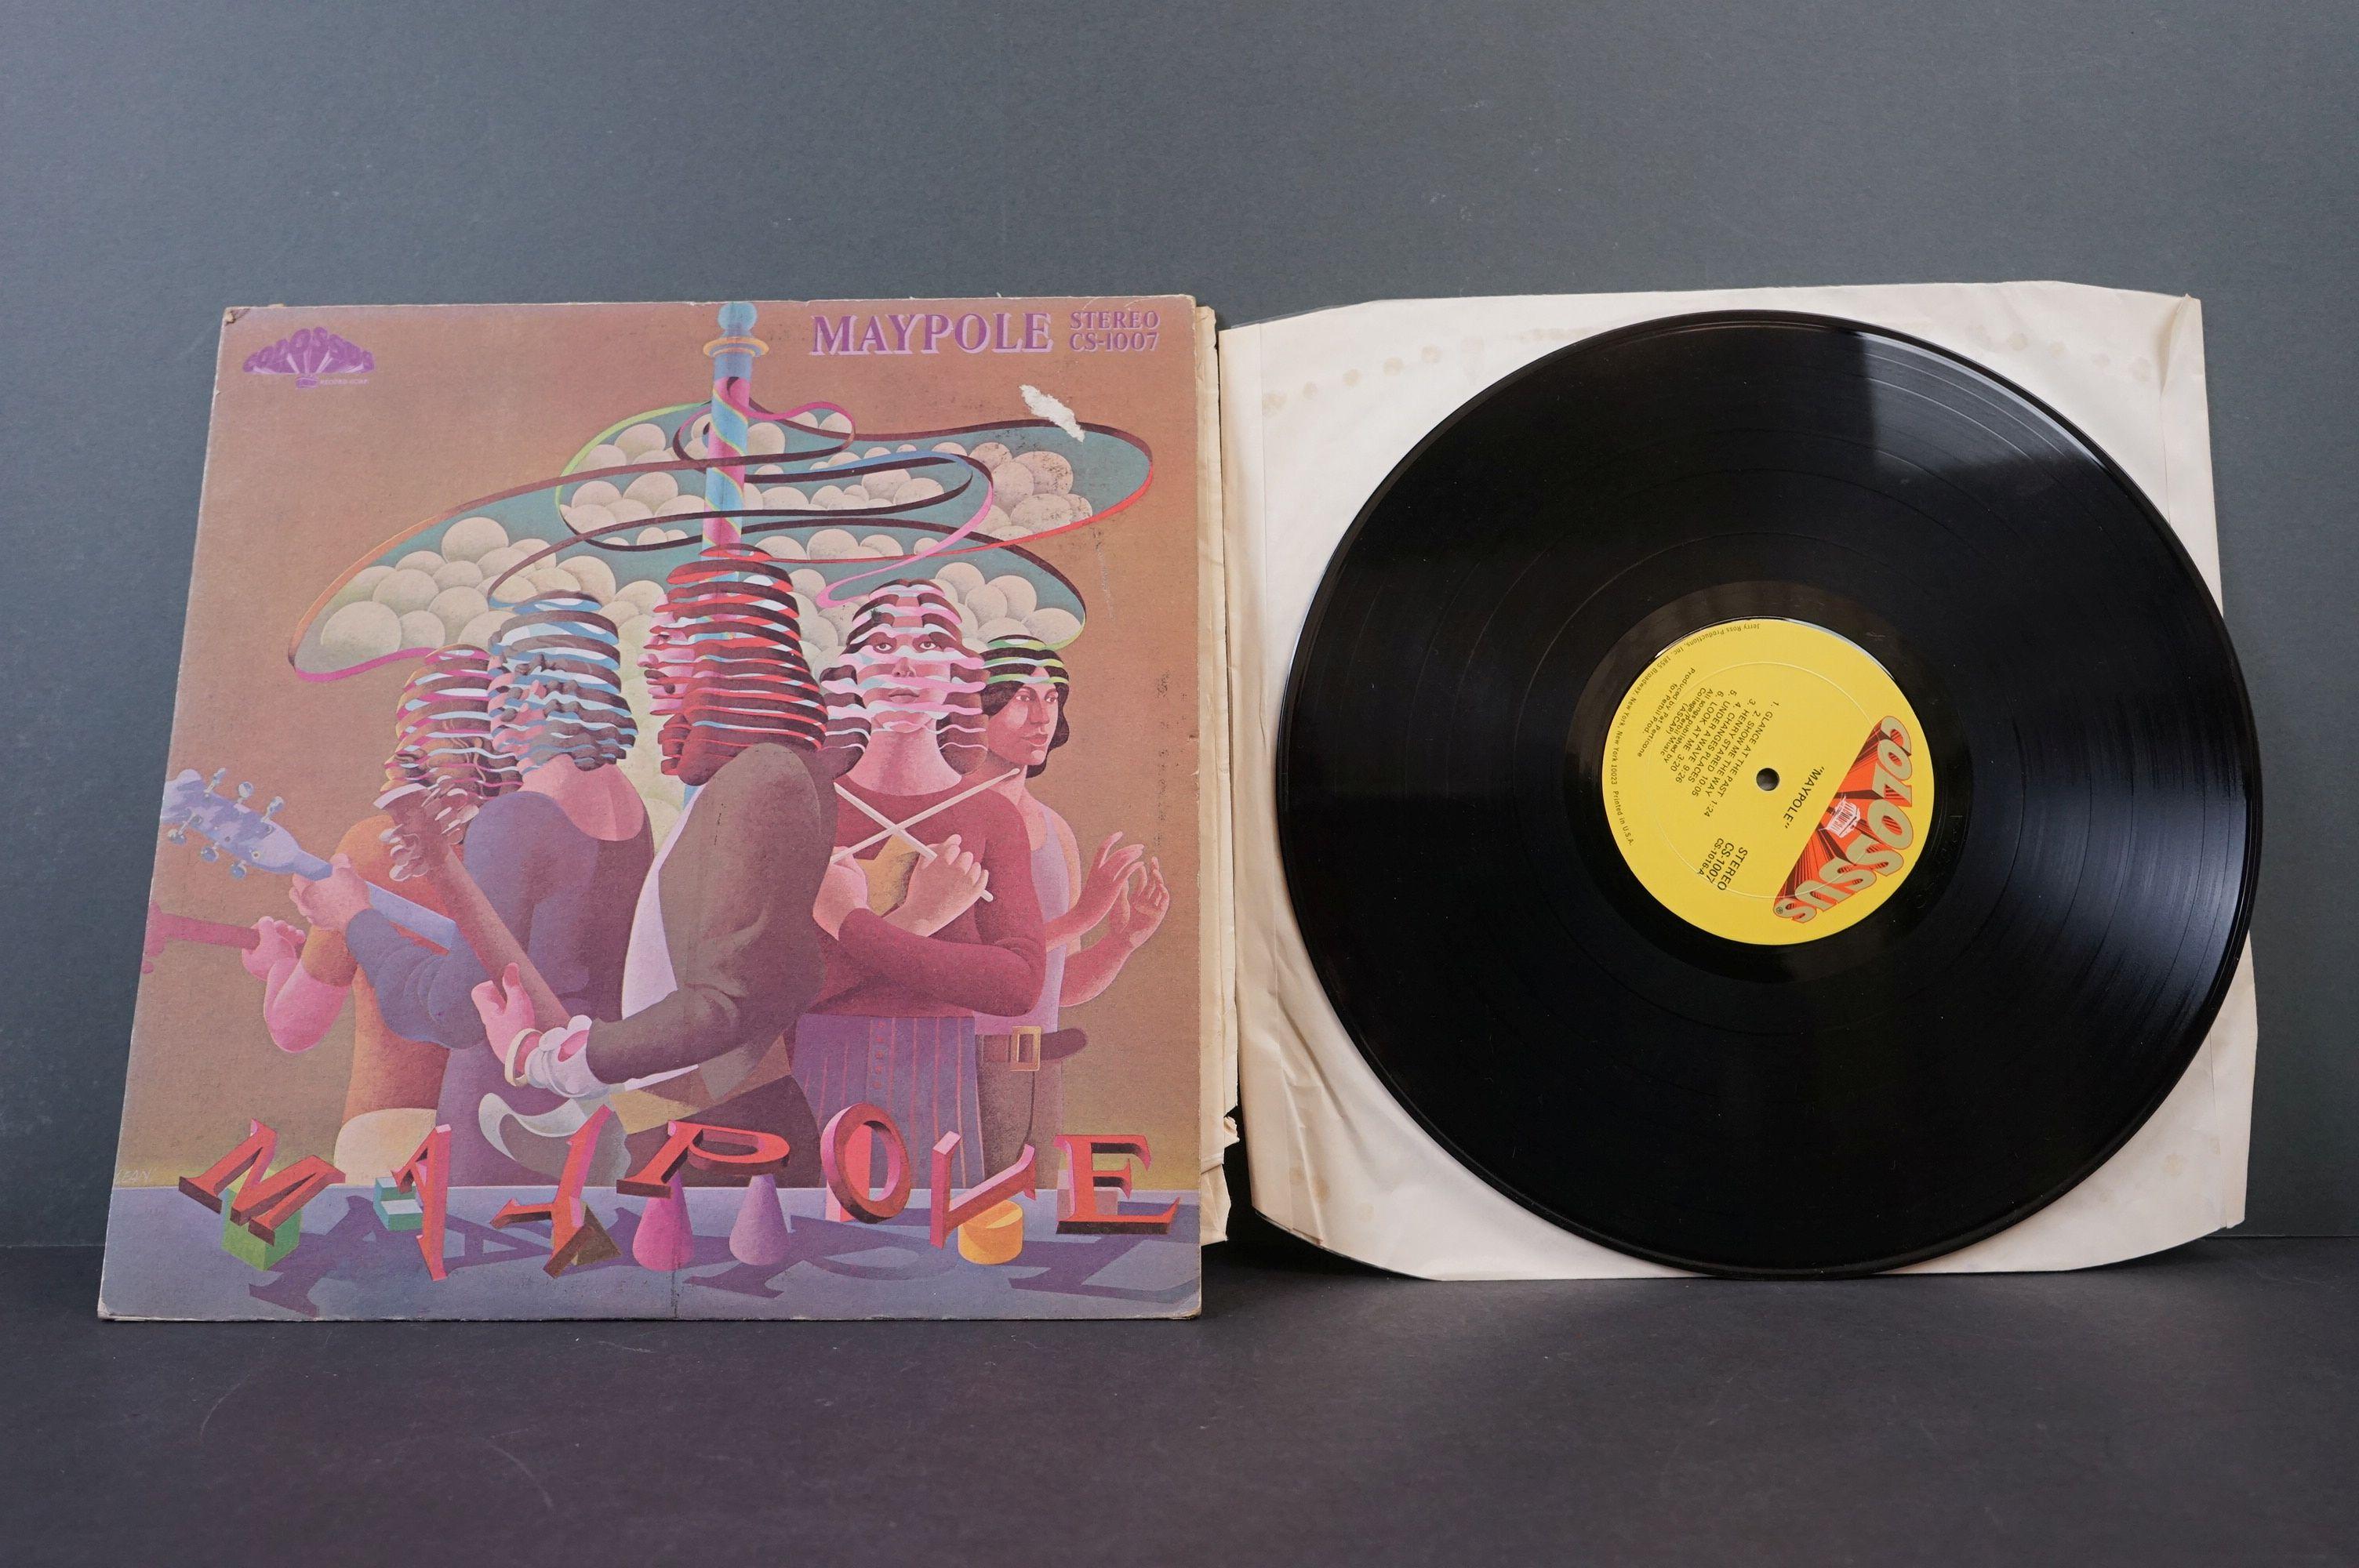 Vinyl - Psych - Three original Rare US pressing Psych albums. Maypole - Maypole (1971 US, Colossus - Image 2 of 8